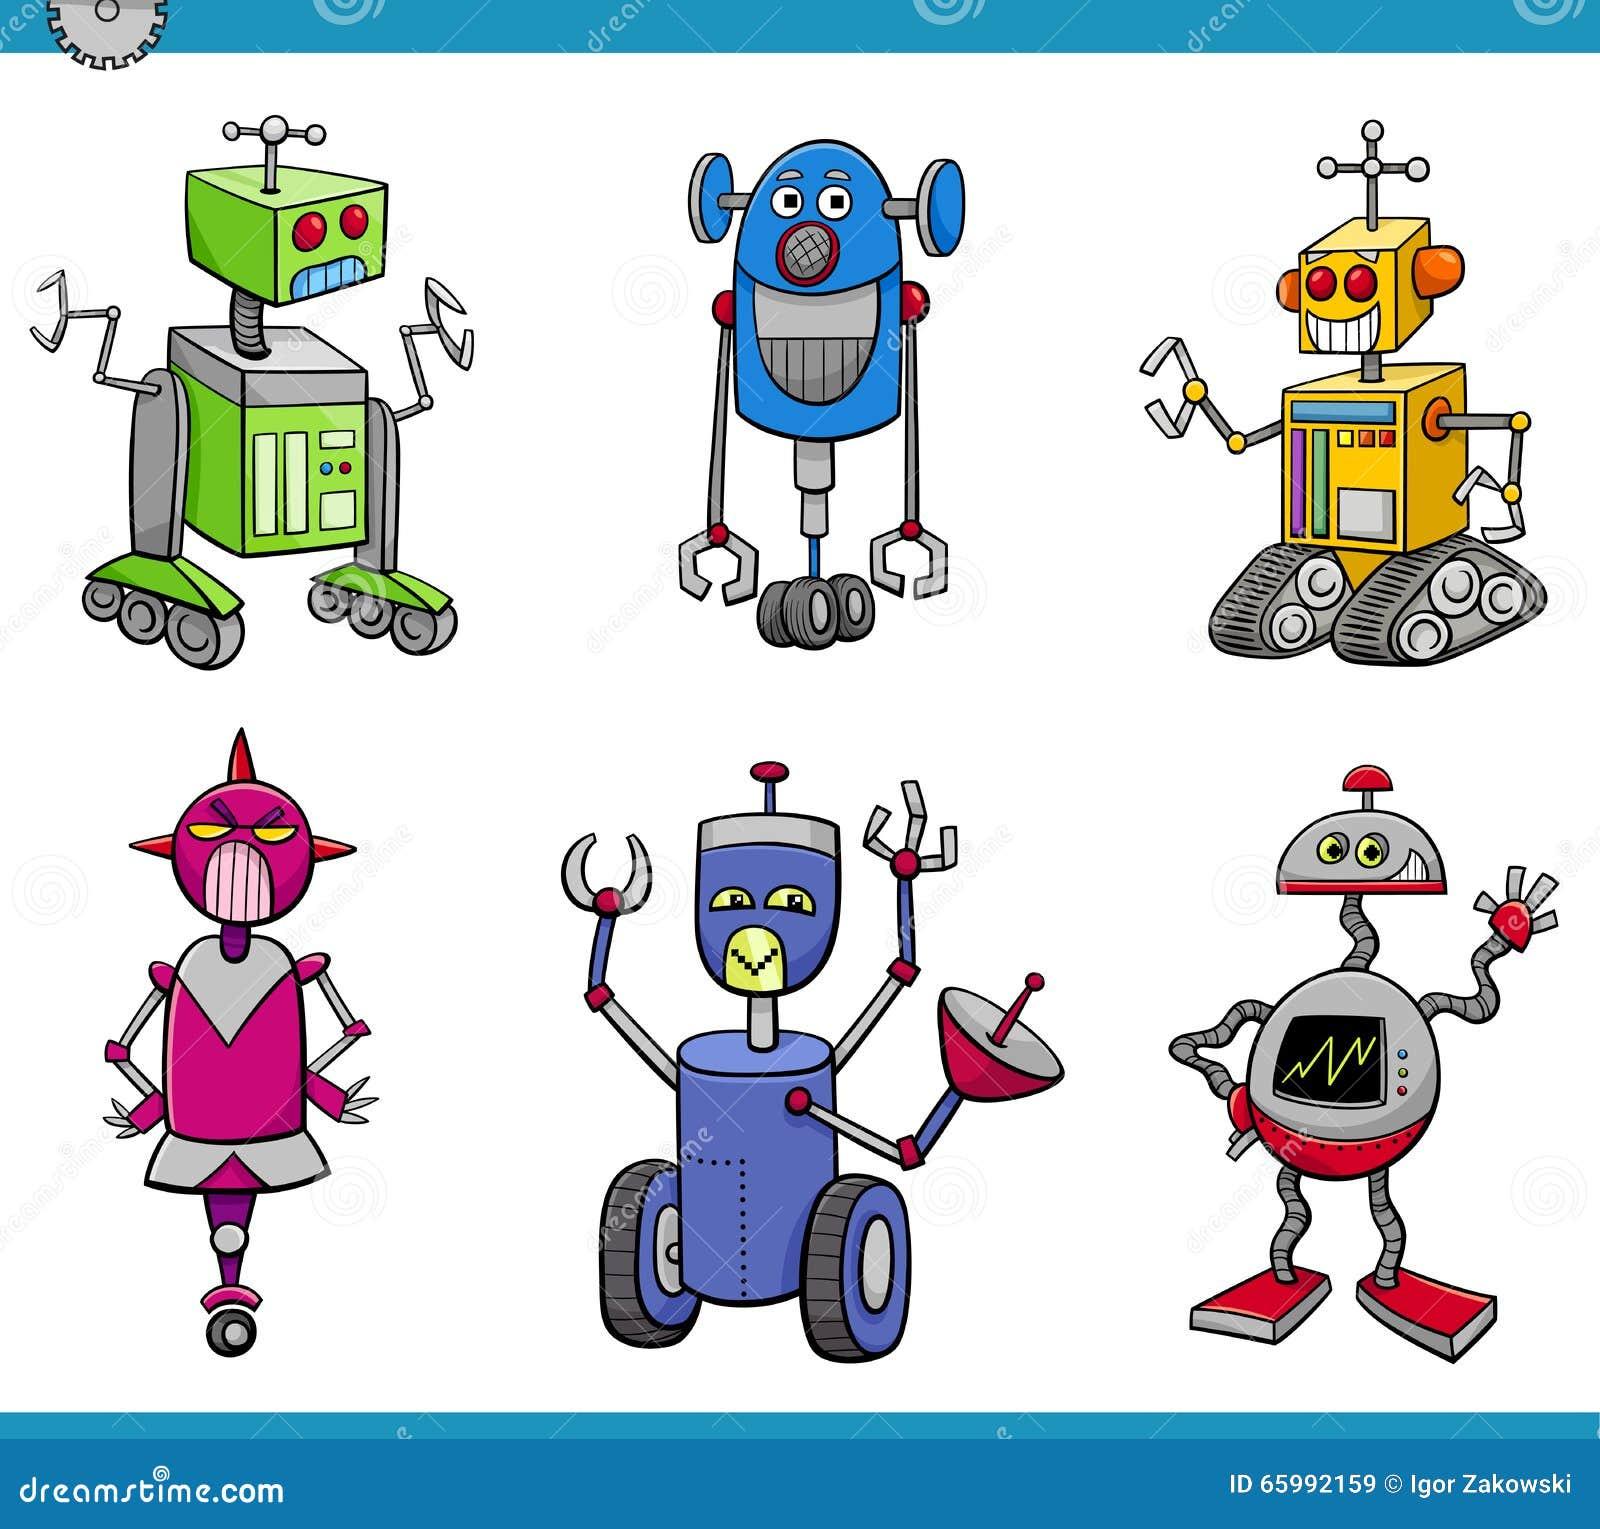 Cartoon Characters As Robots : Robot characters cartoon set stock vector illustration